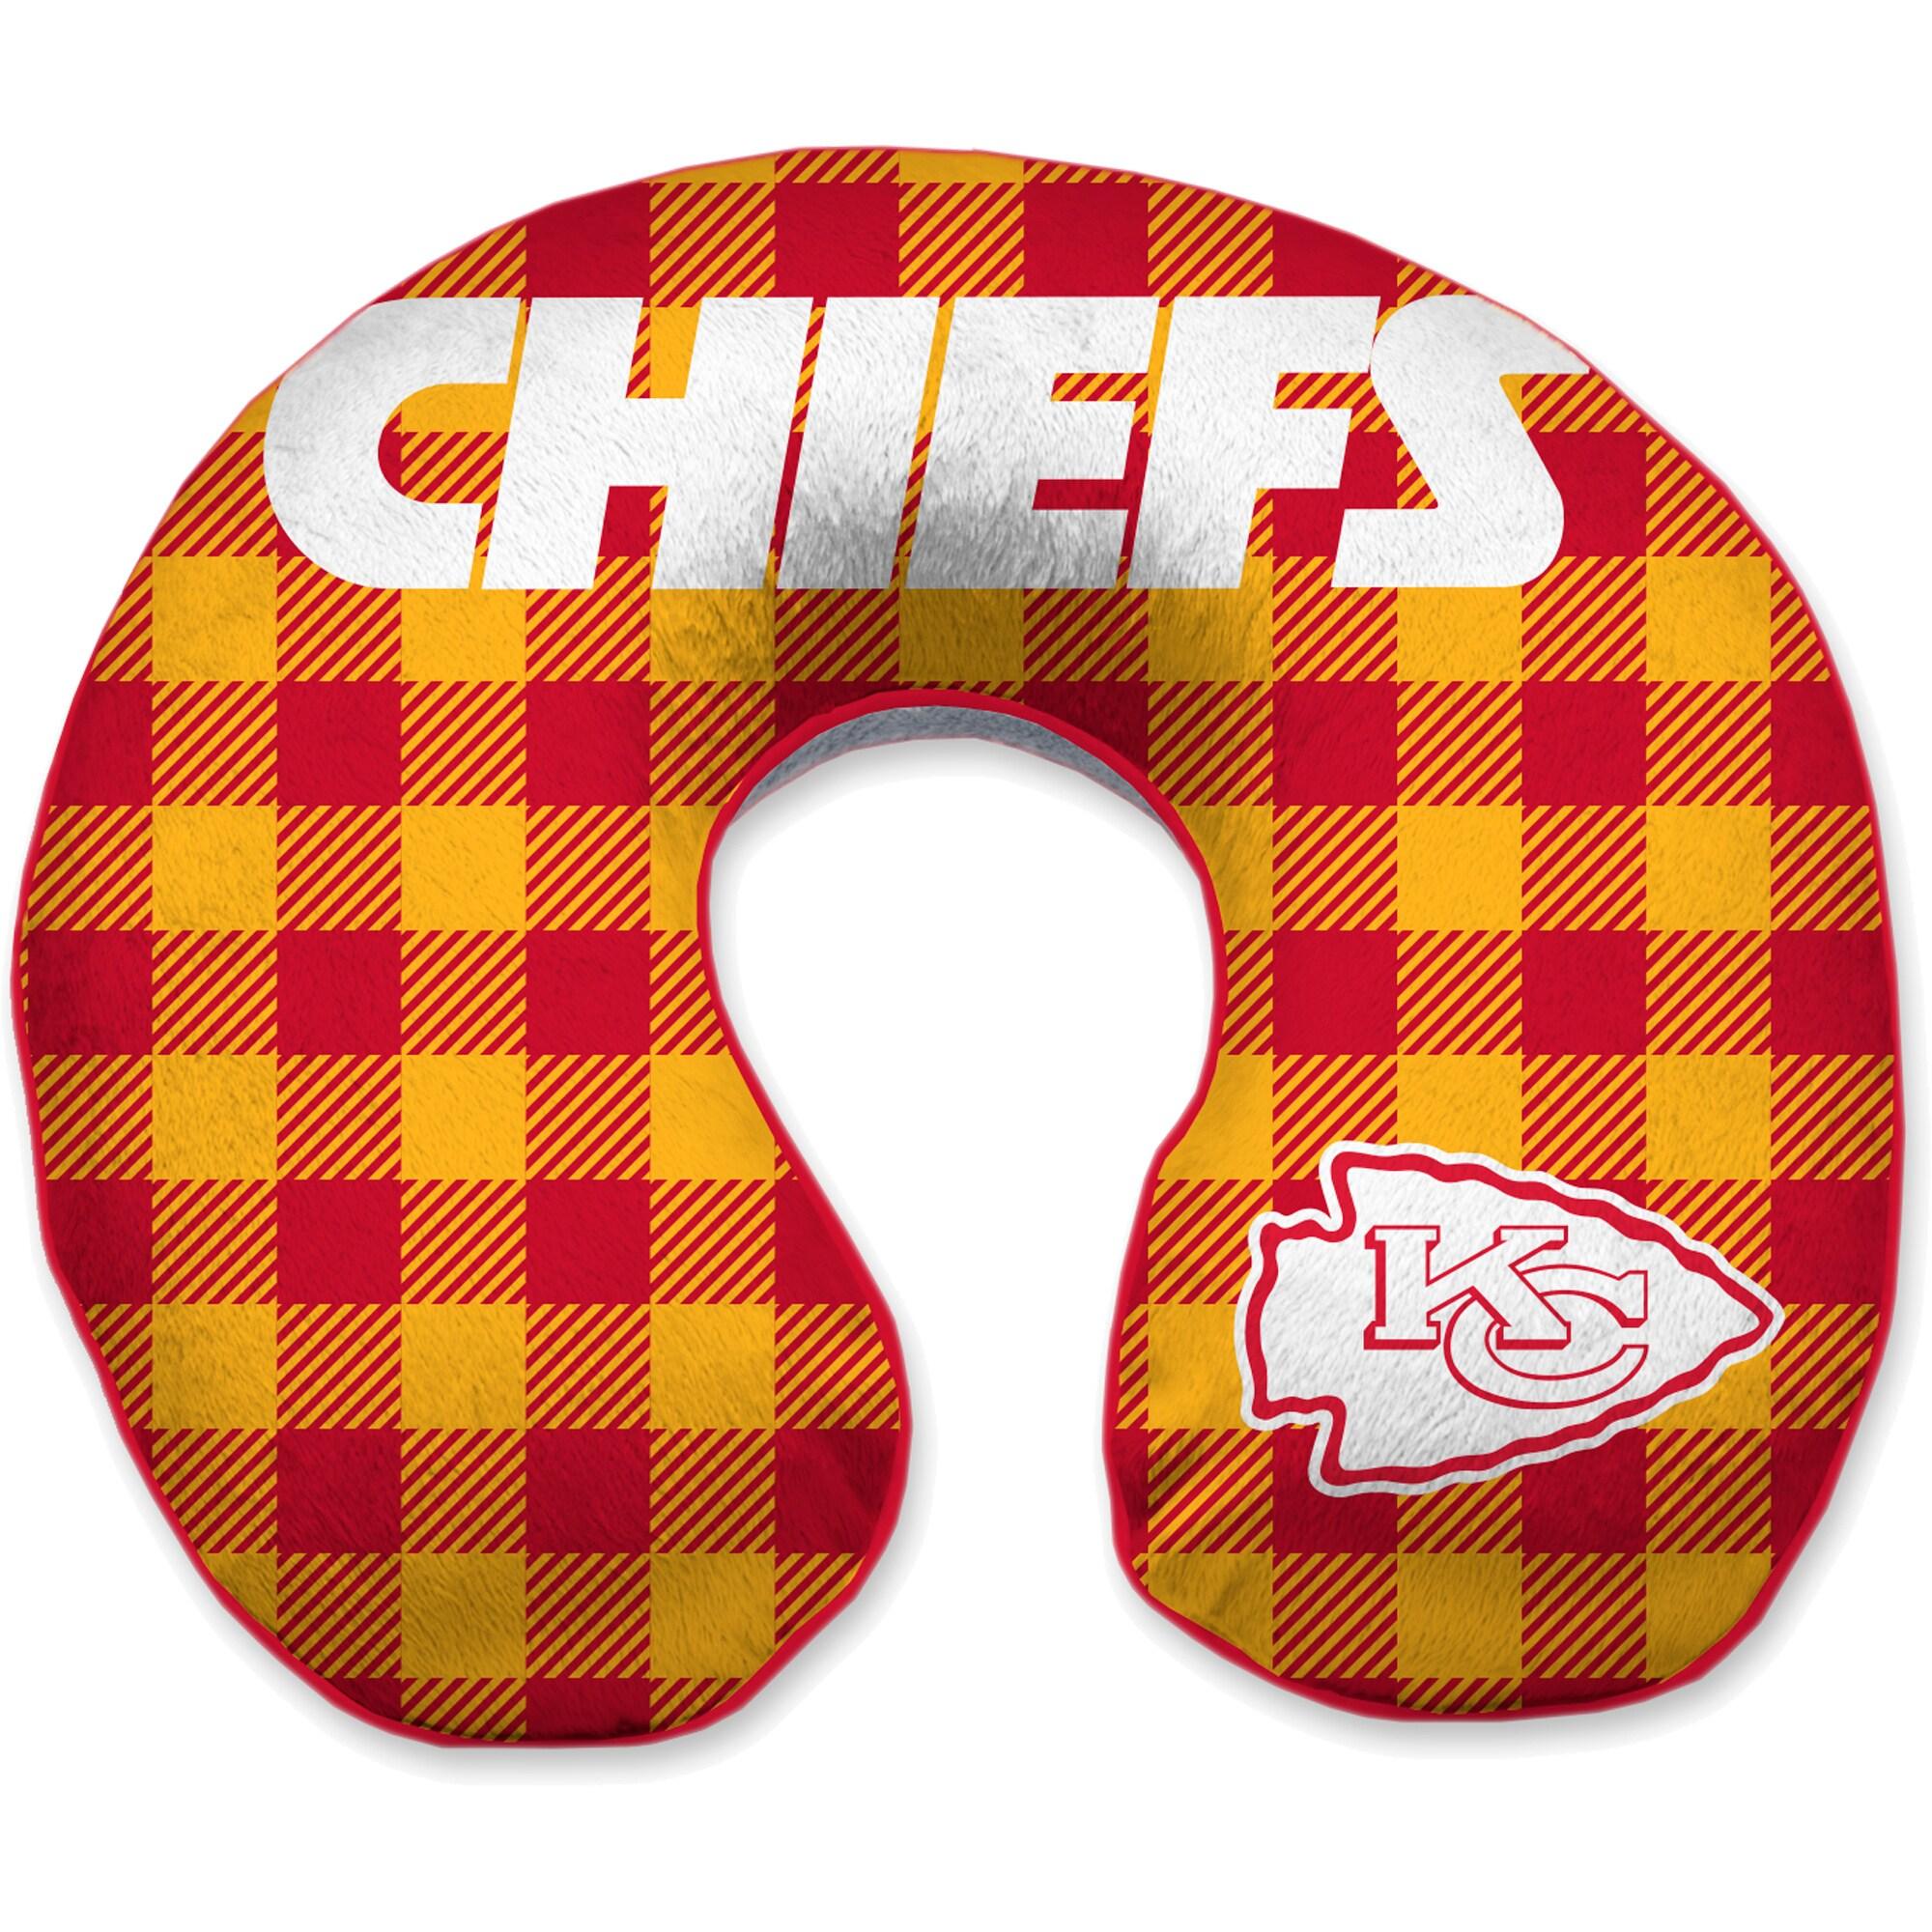 Kansas City Chiefs Buffalo Check Sherpa Memory Foam Travel Pillow - Red